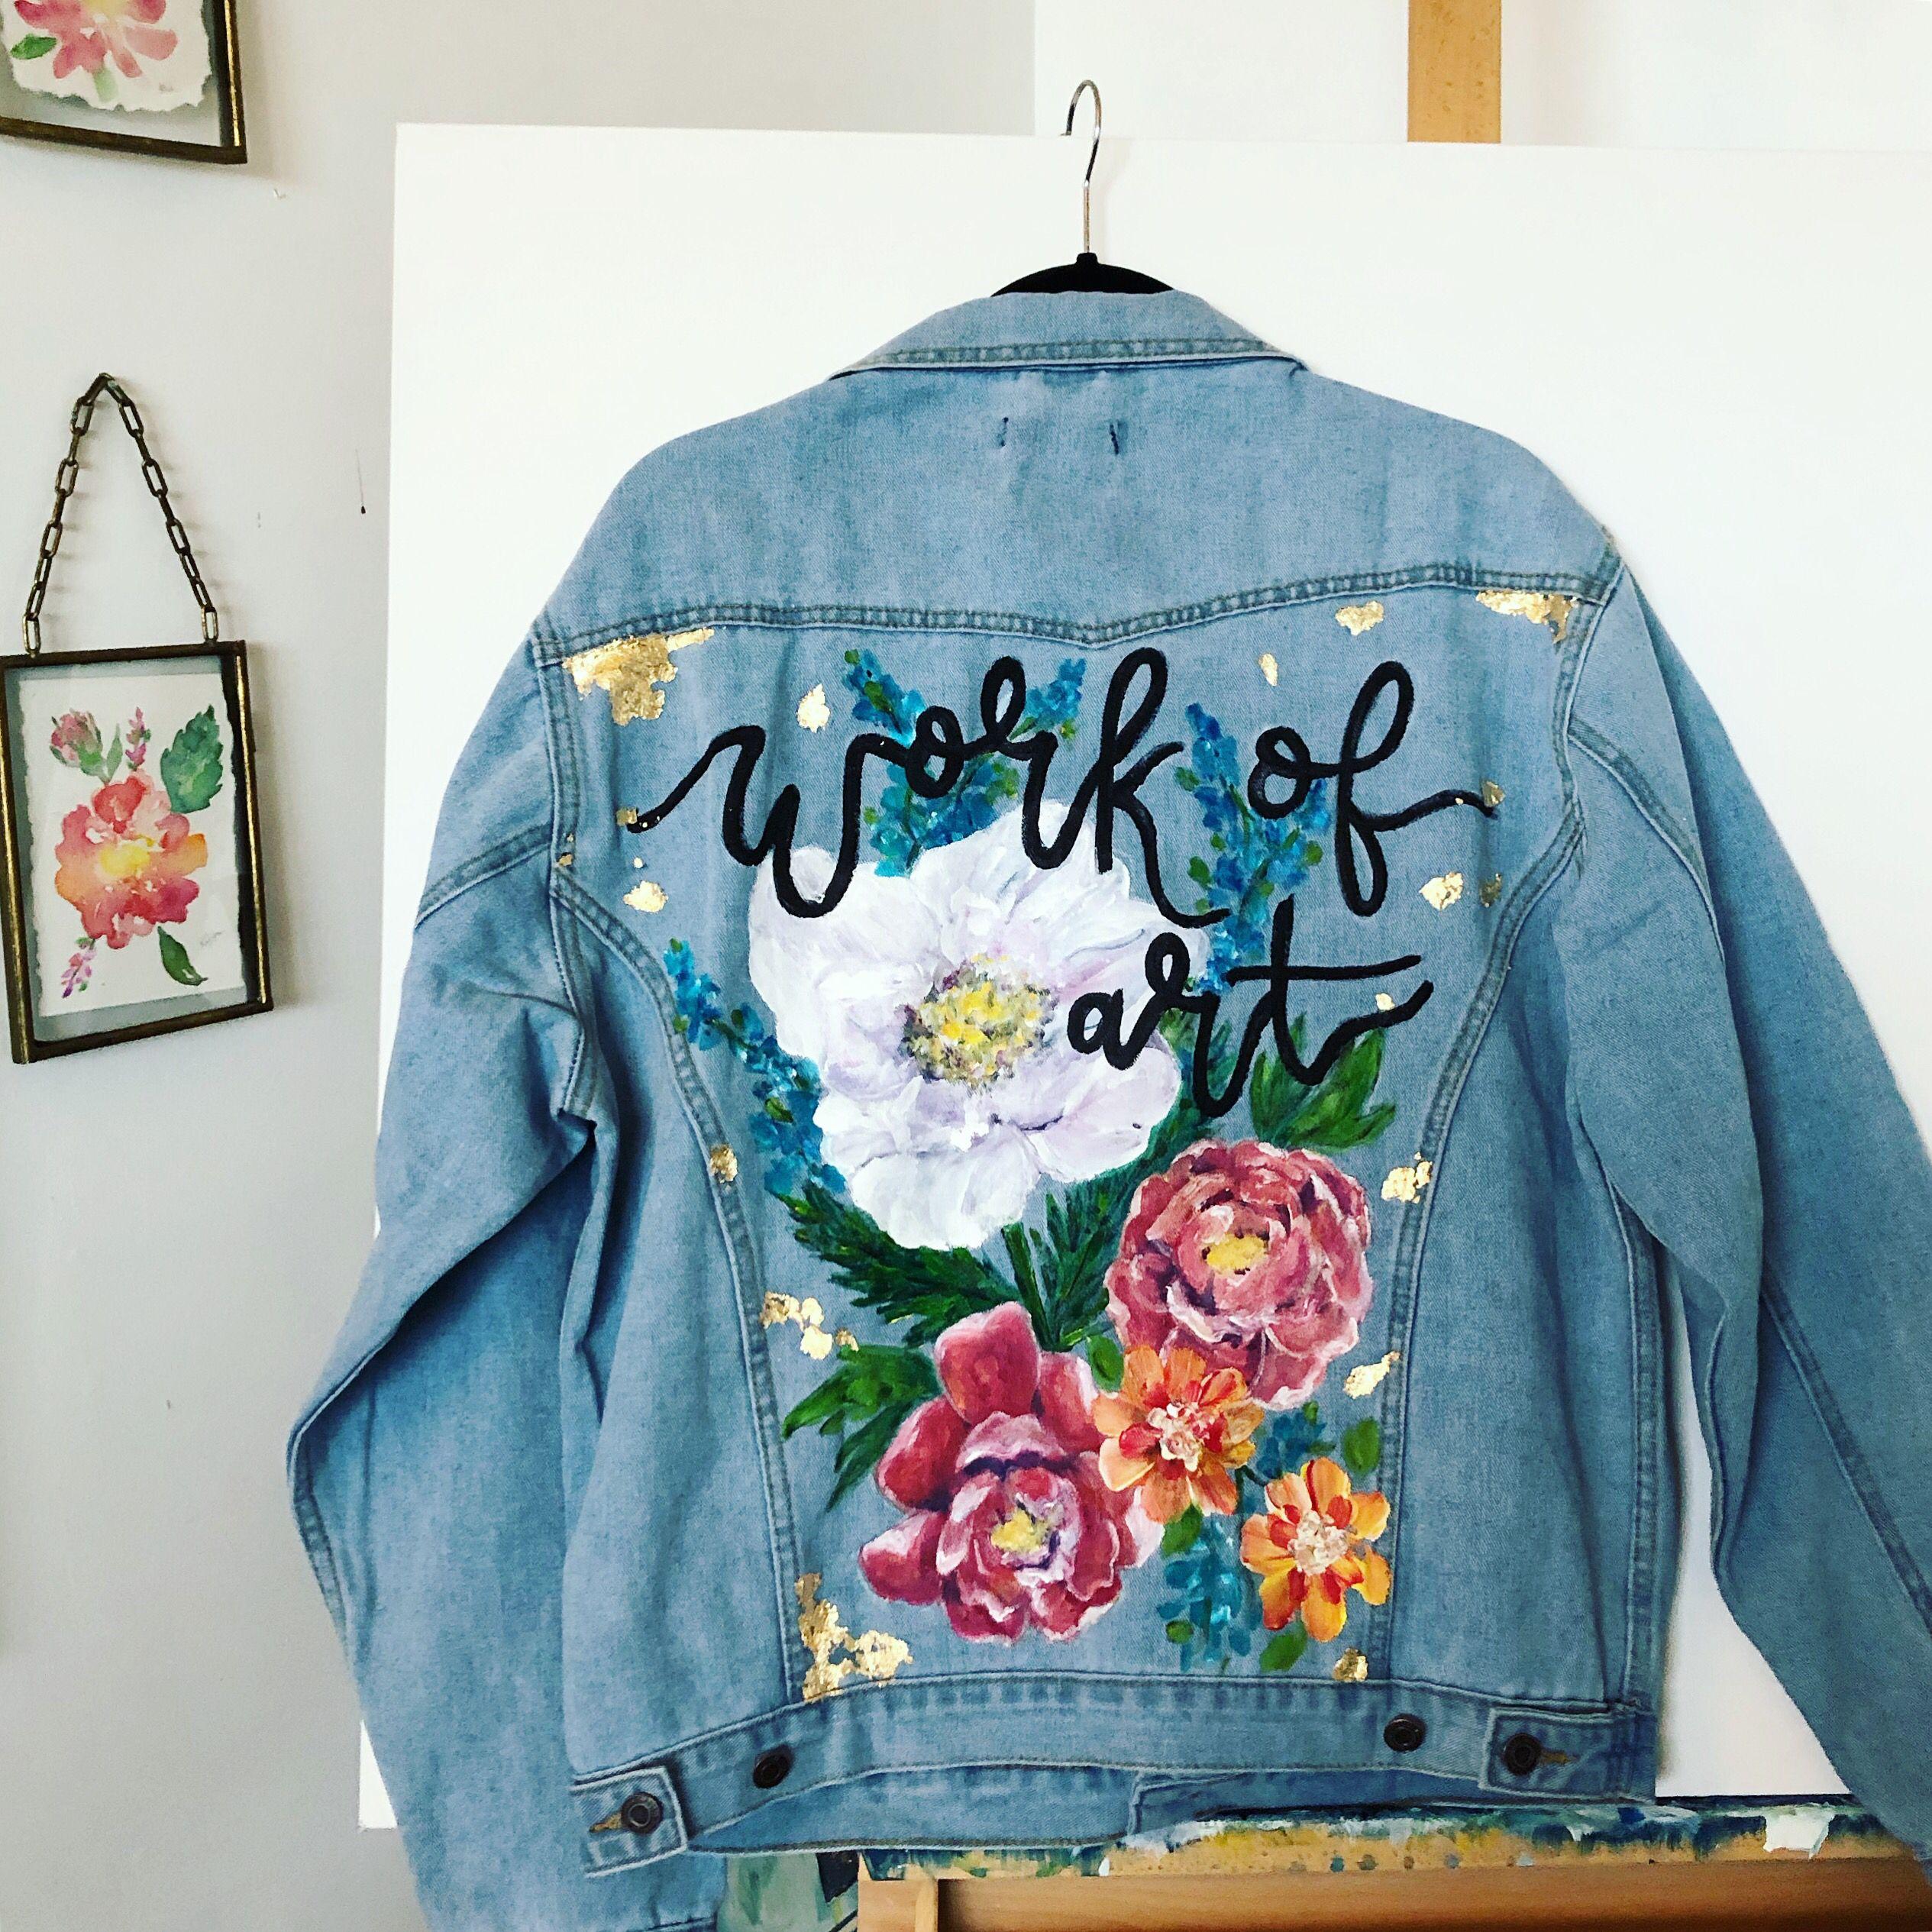 Boyfriend Jean Jacket Art With Gold Leafing Copyright Copeley Designs Art Jean Jacket Design Denim Design Diy Jacket [ 2530 x 2530 Pixel ]